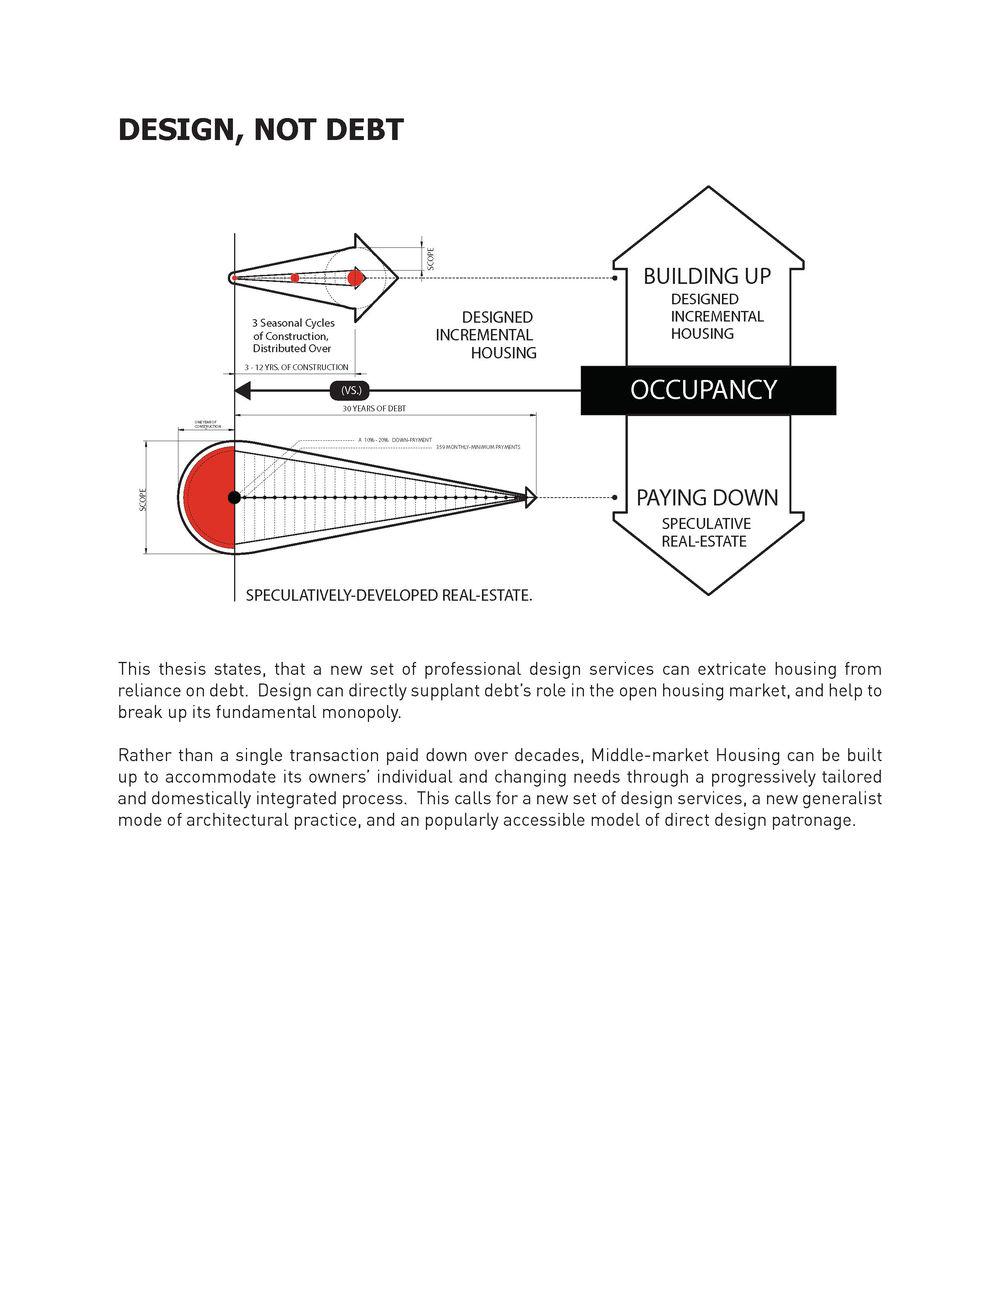 DSA_CMiller_Thesis_Slides_Boards_03_30_2013_Page_07.jpg